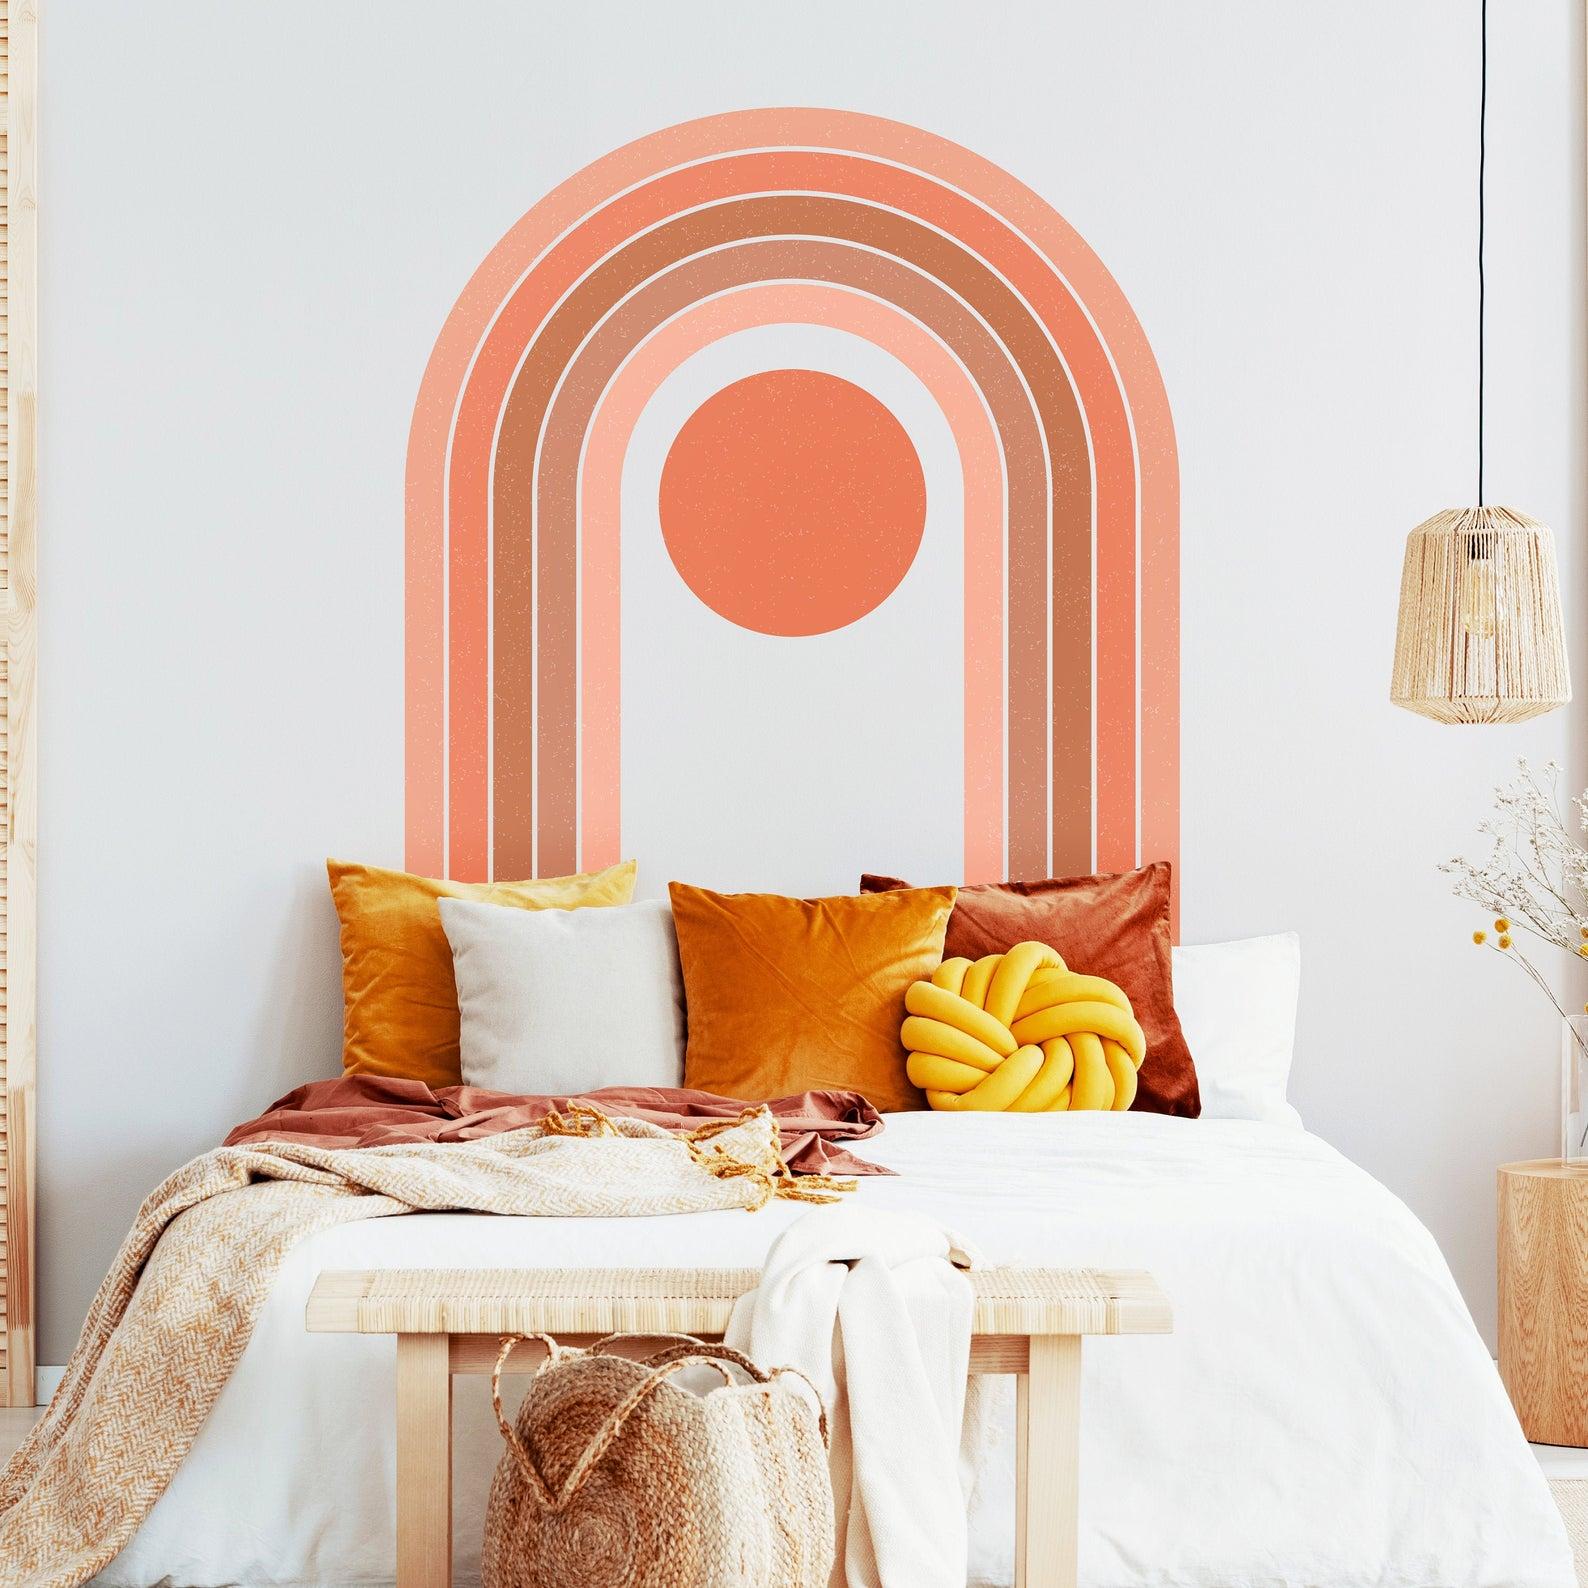 Rainbow-wall-sticker-headboard-idea-49097